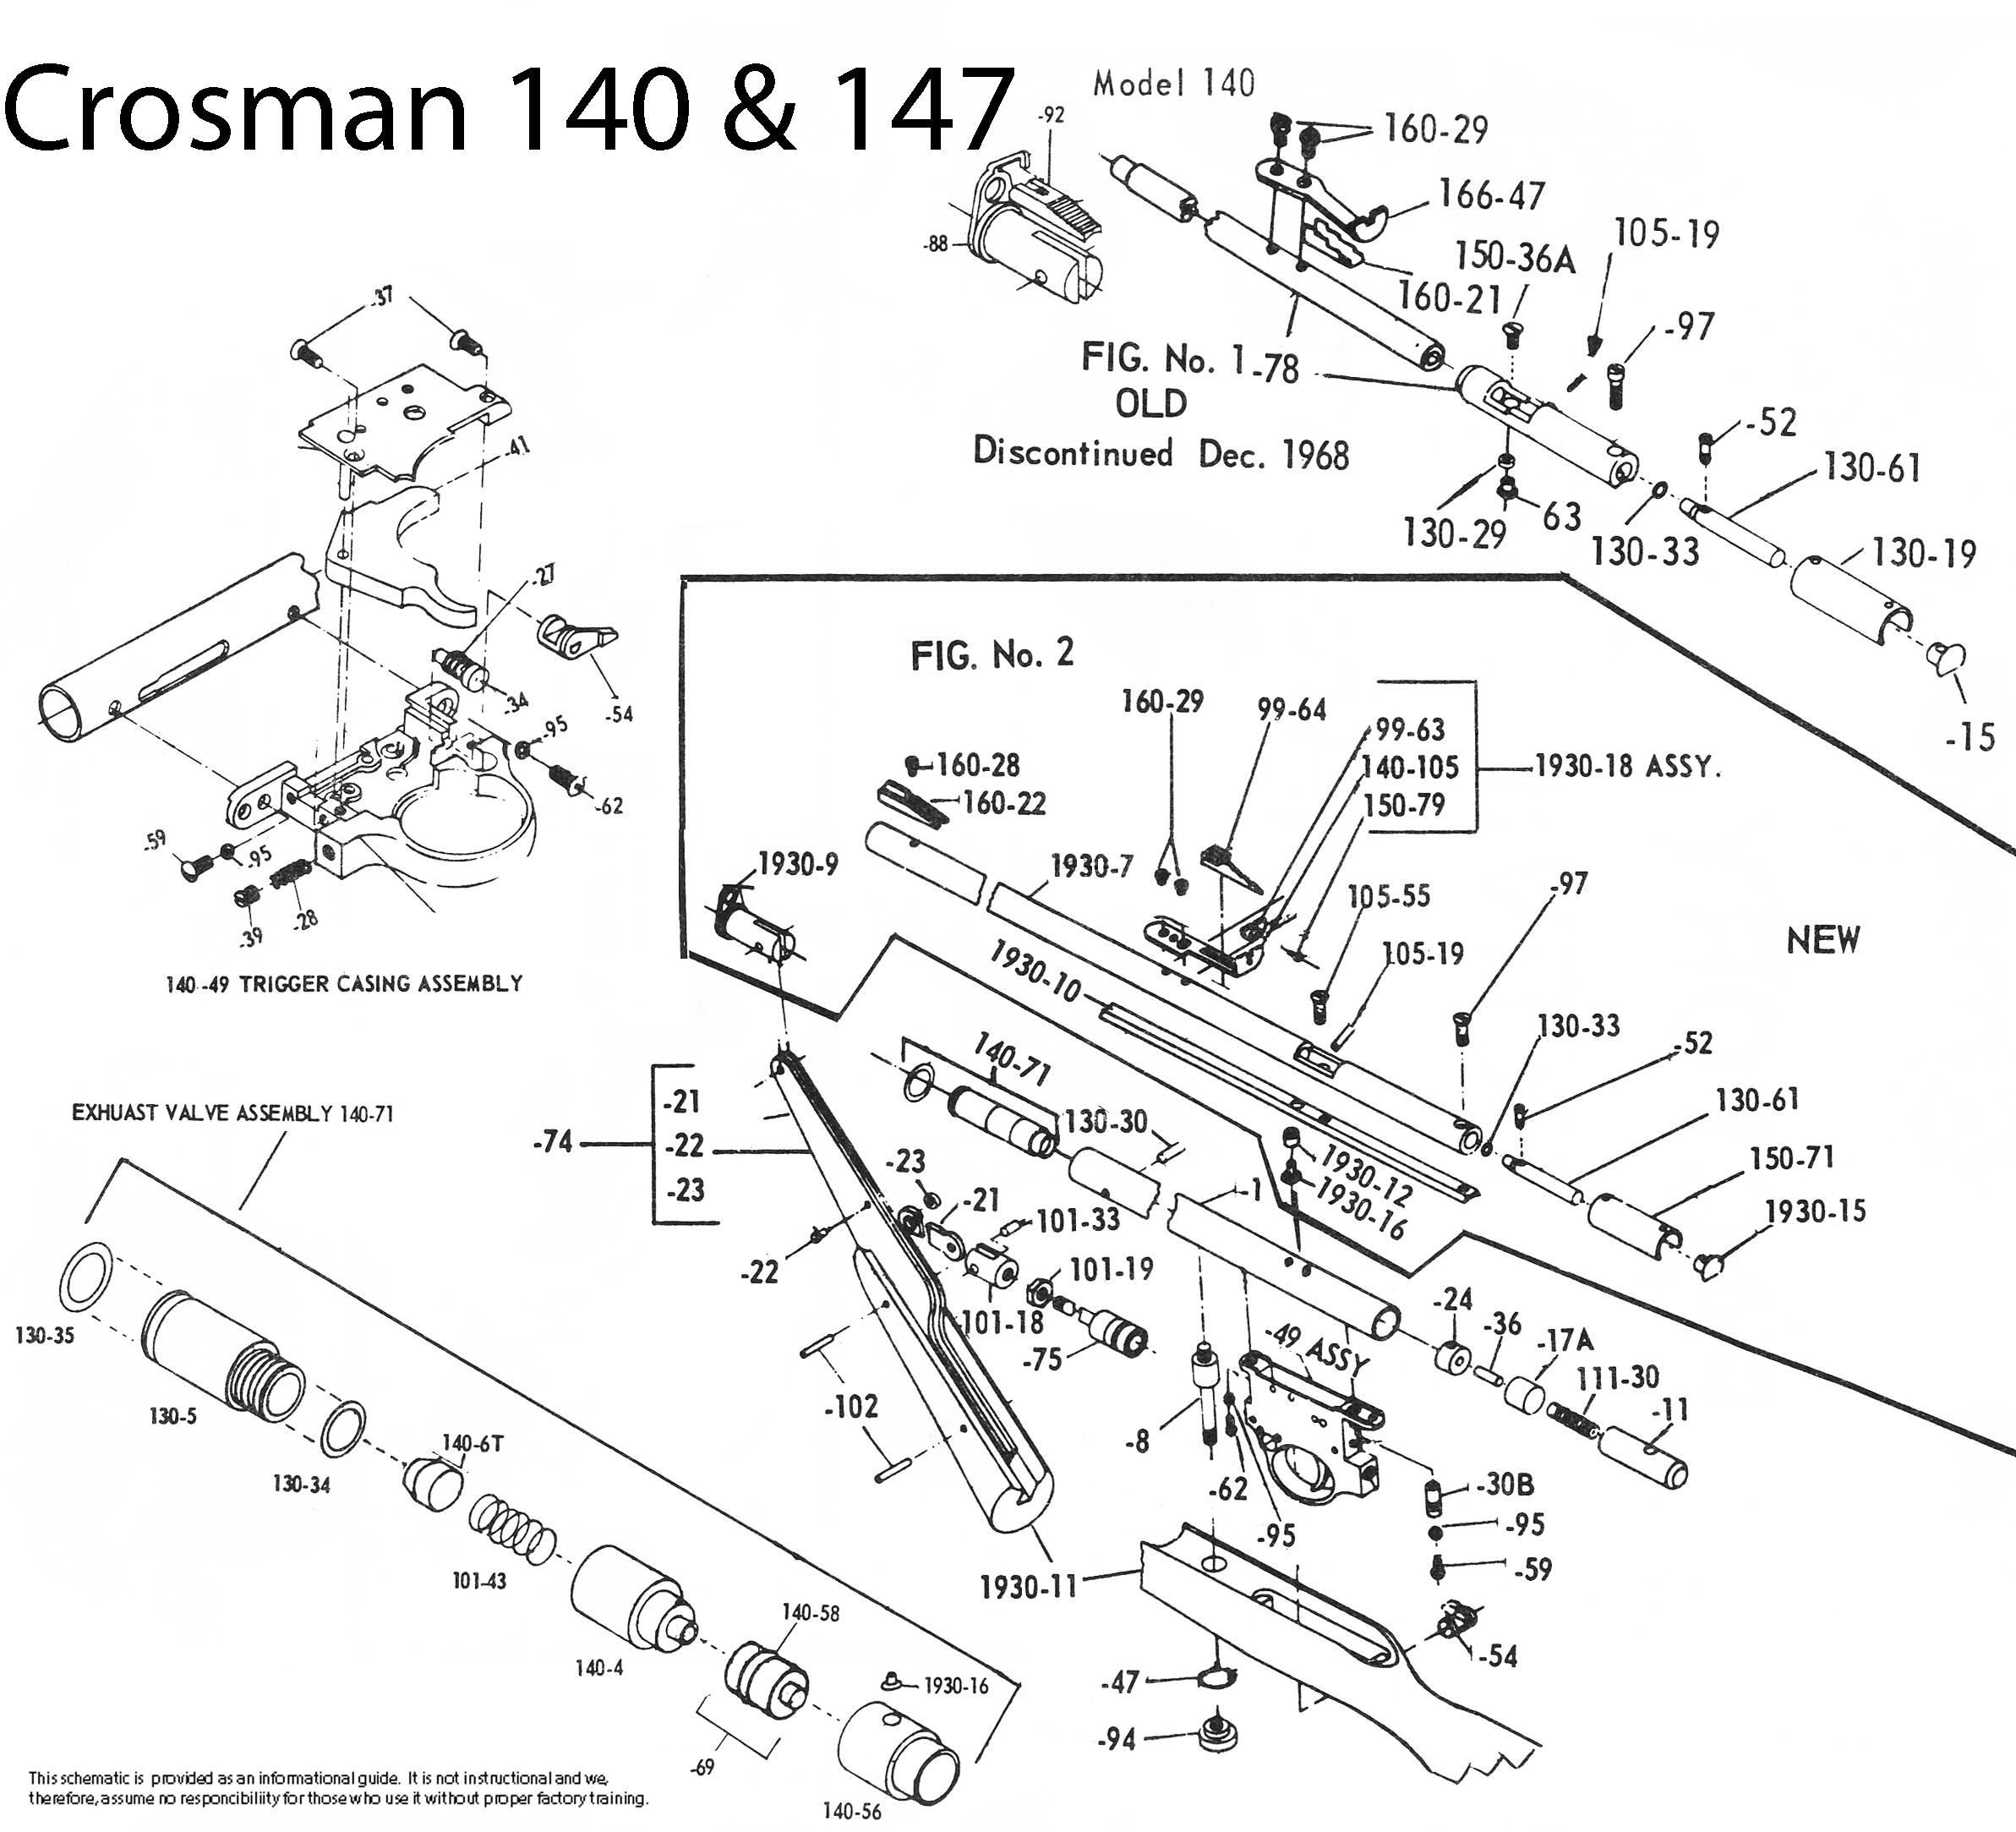 CRS140FSM1972 DOWNLOAD Crosman 140 Factory Service Manual